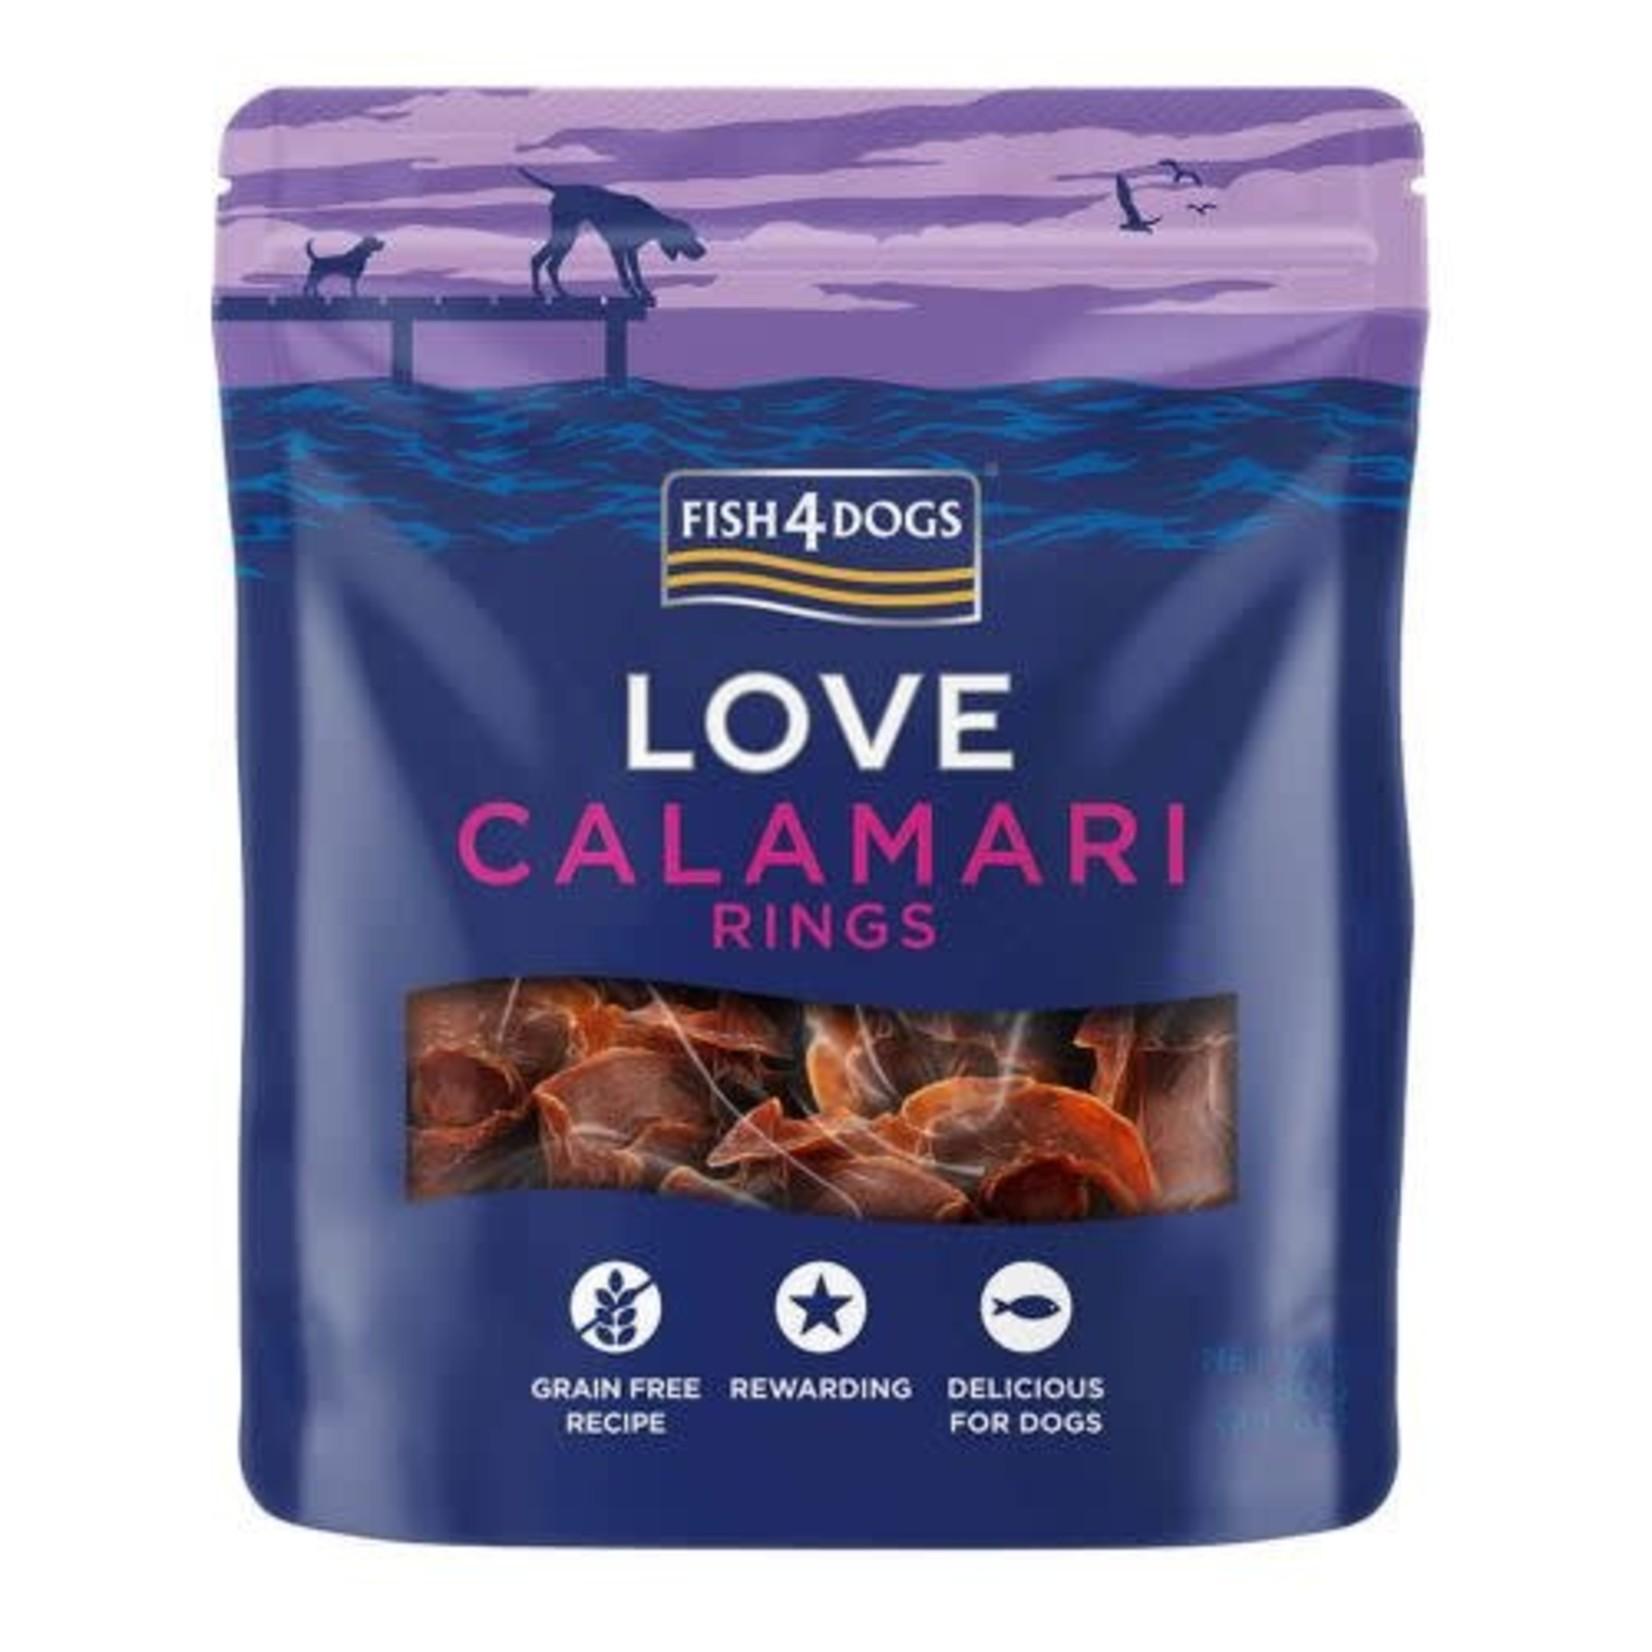 Fish4Dogs Love Calamari Rings Treats for Dogs, 60g